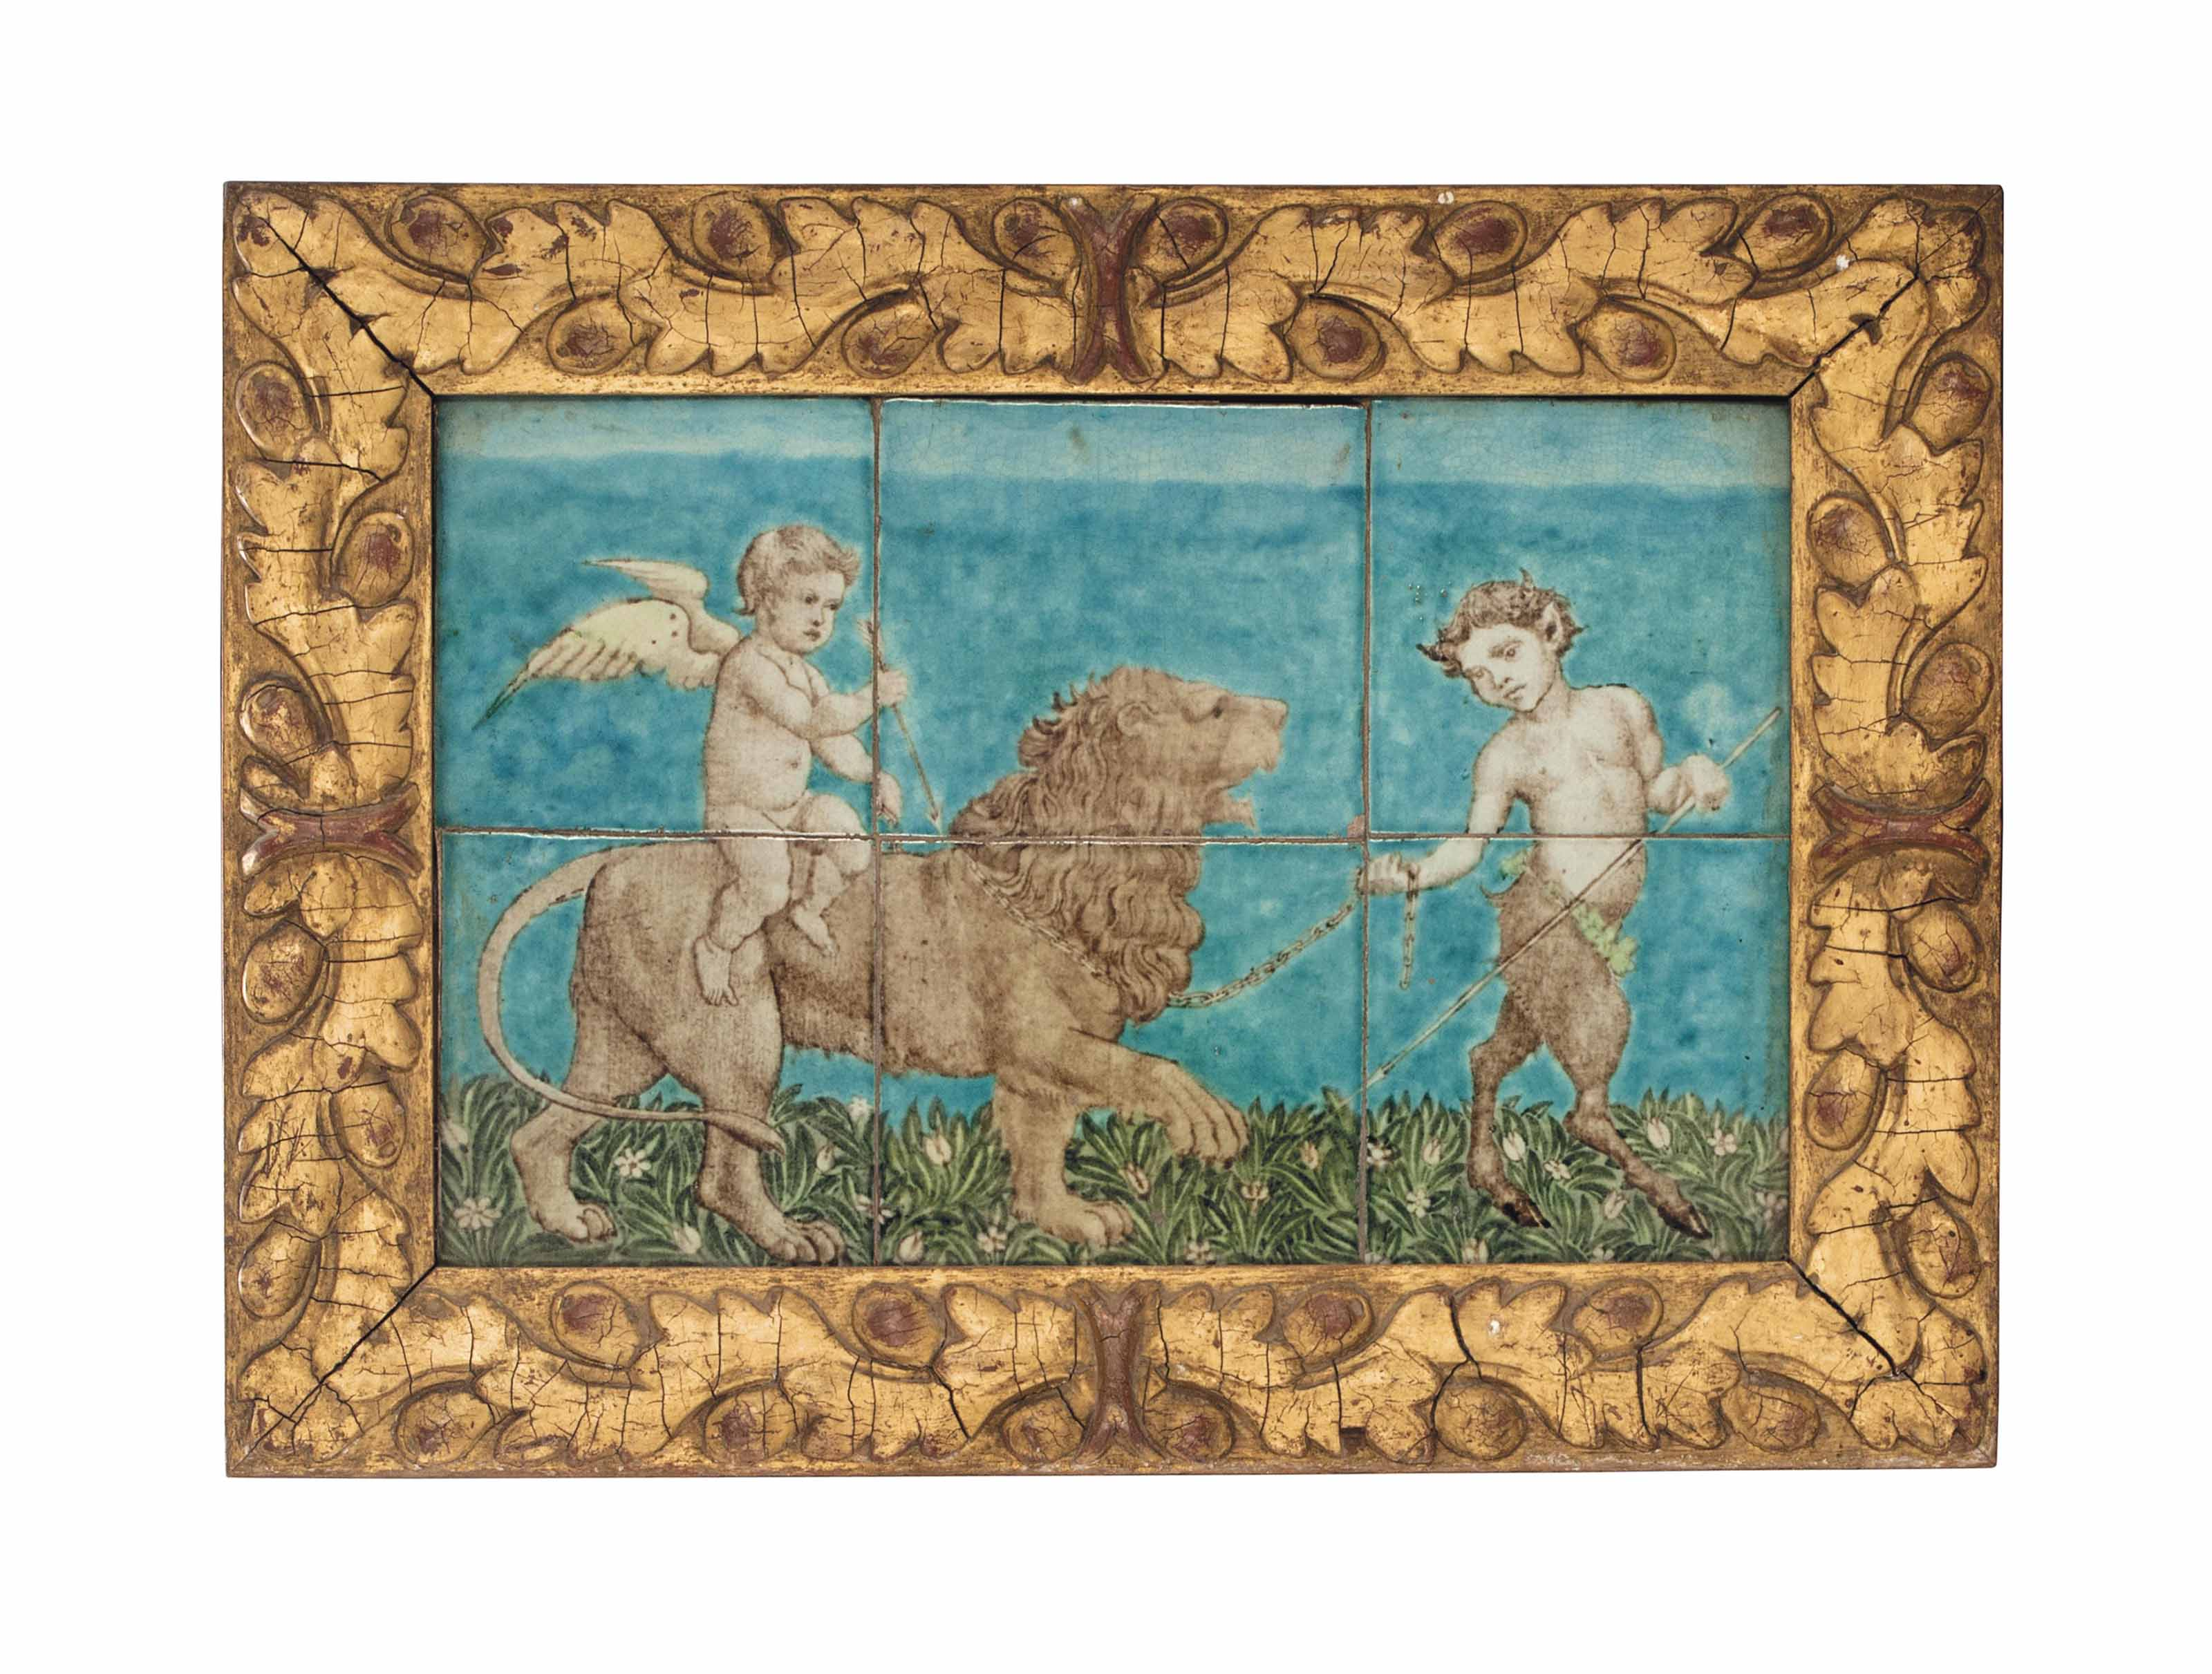 'CUPID, LION AND FAUN', AN EAR